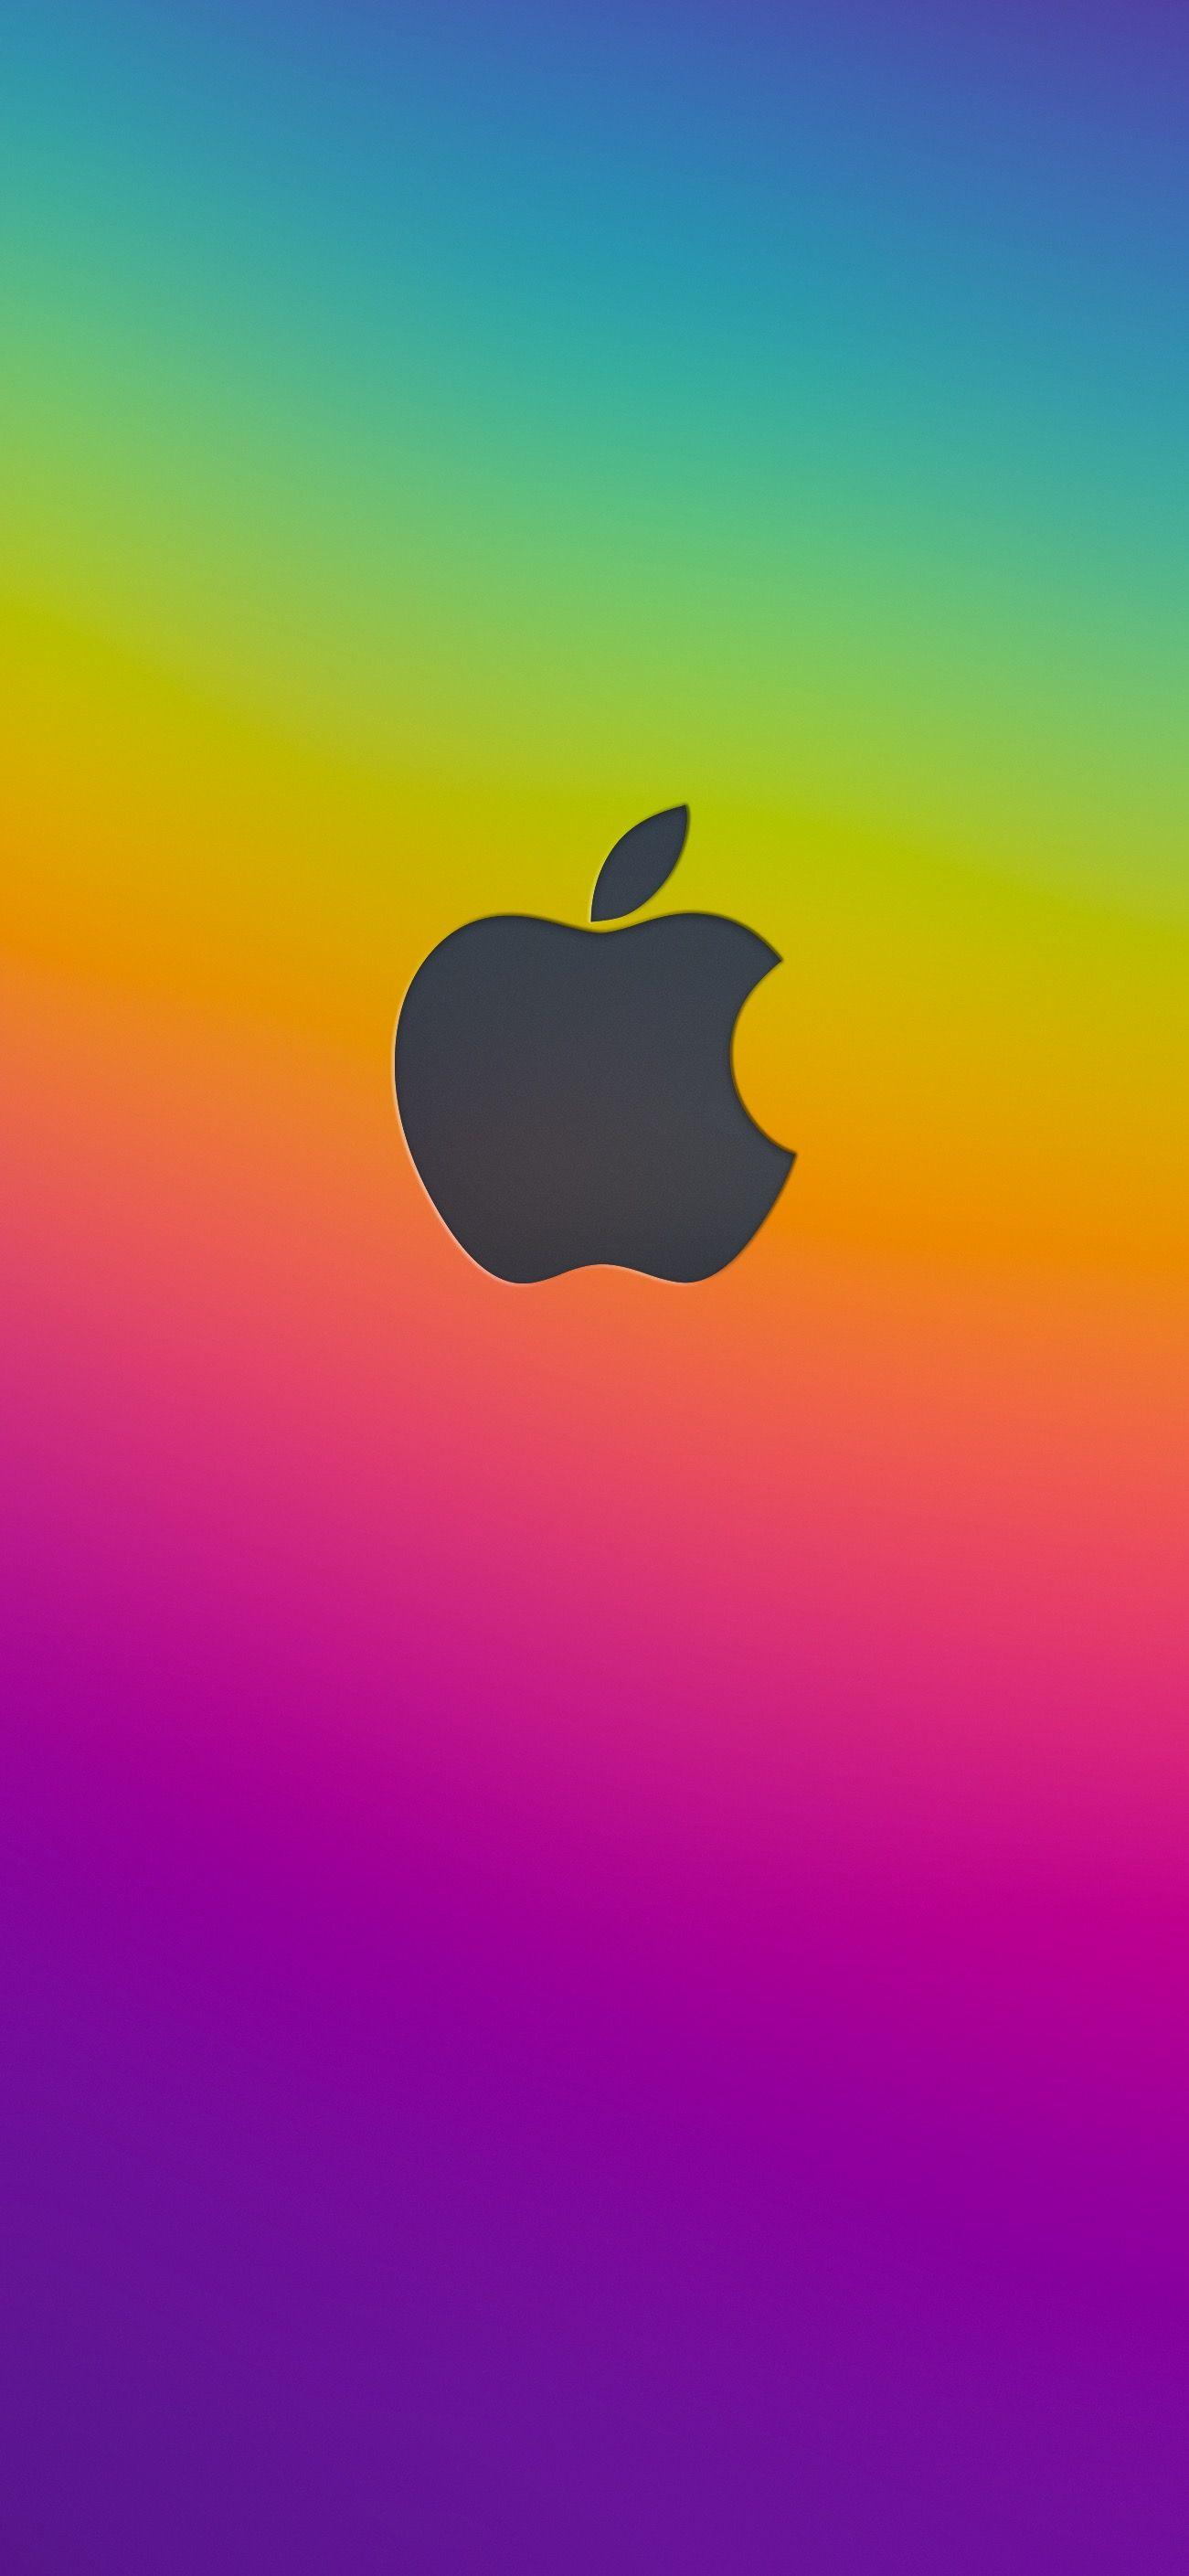 Lockscreen Wallpaper Apple Apple Logo Wallpaper Iphone Apple Wallpaper Iphone Apple Logo Wallpaper